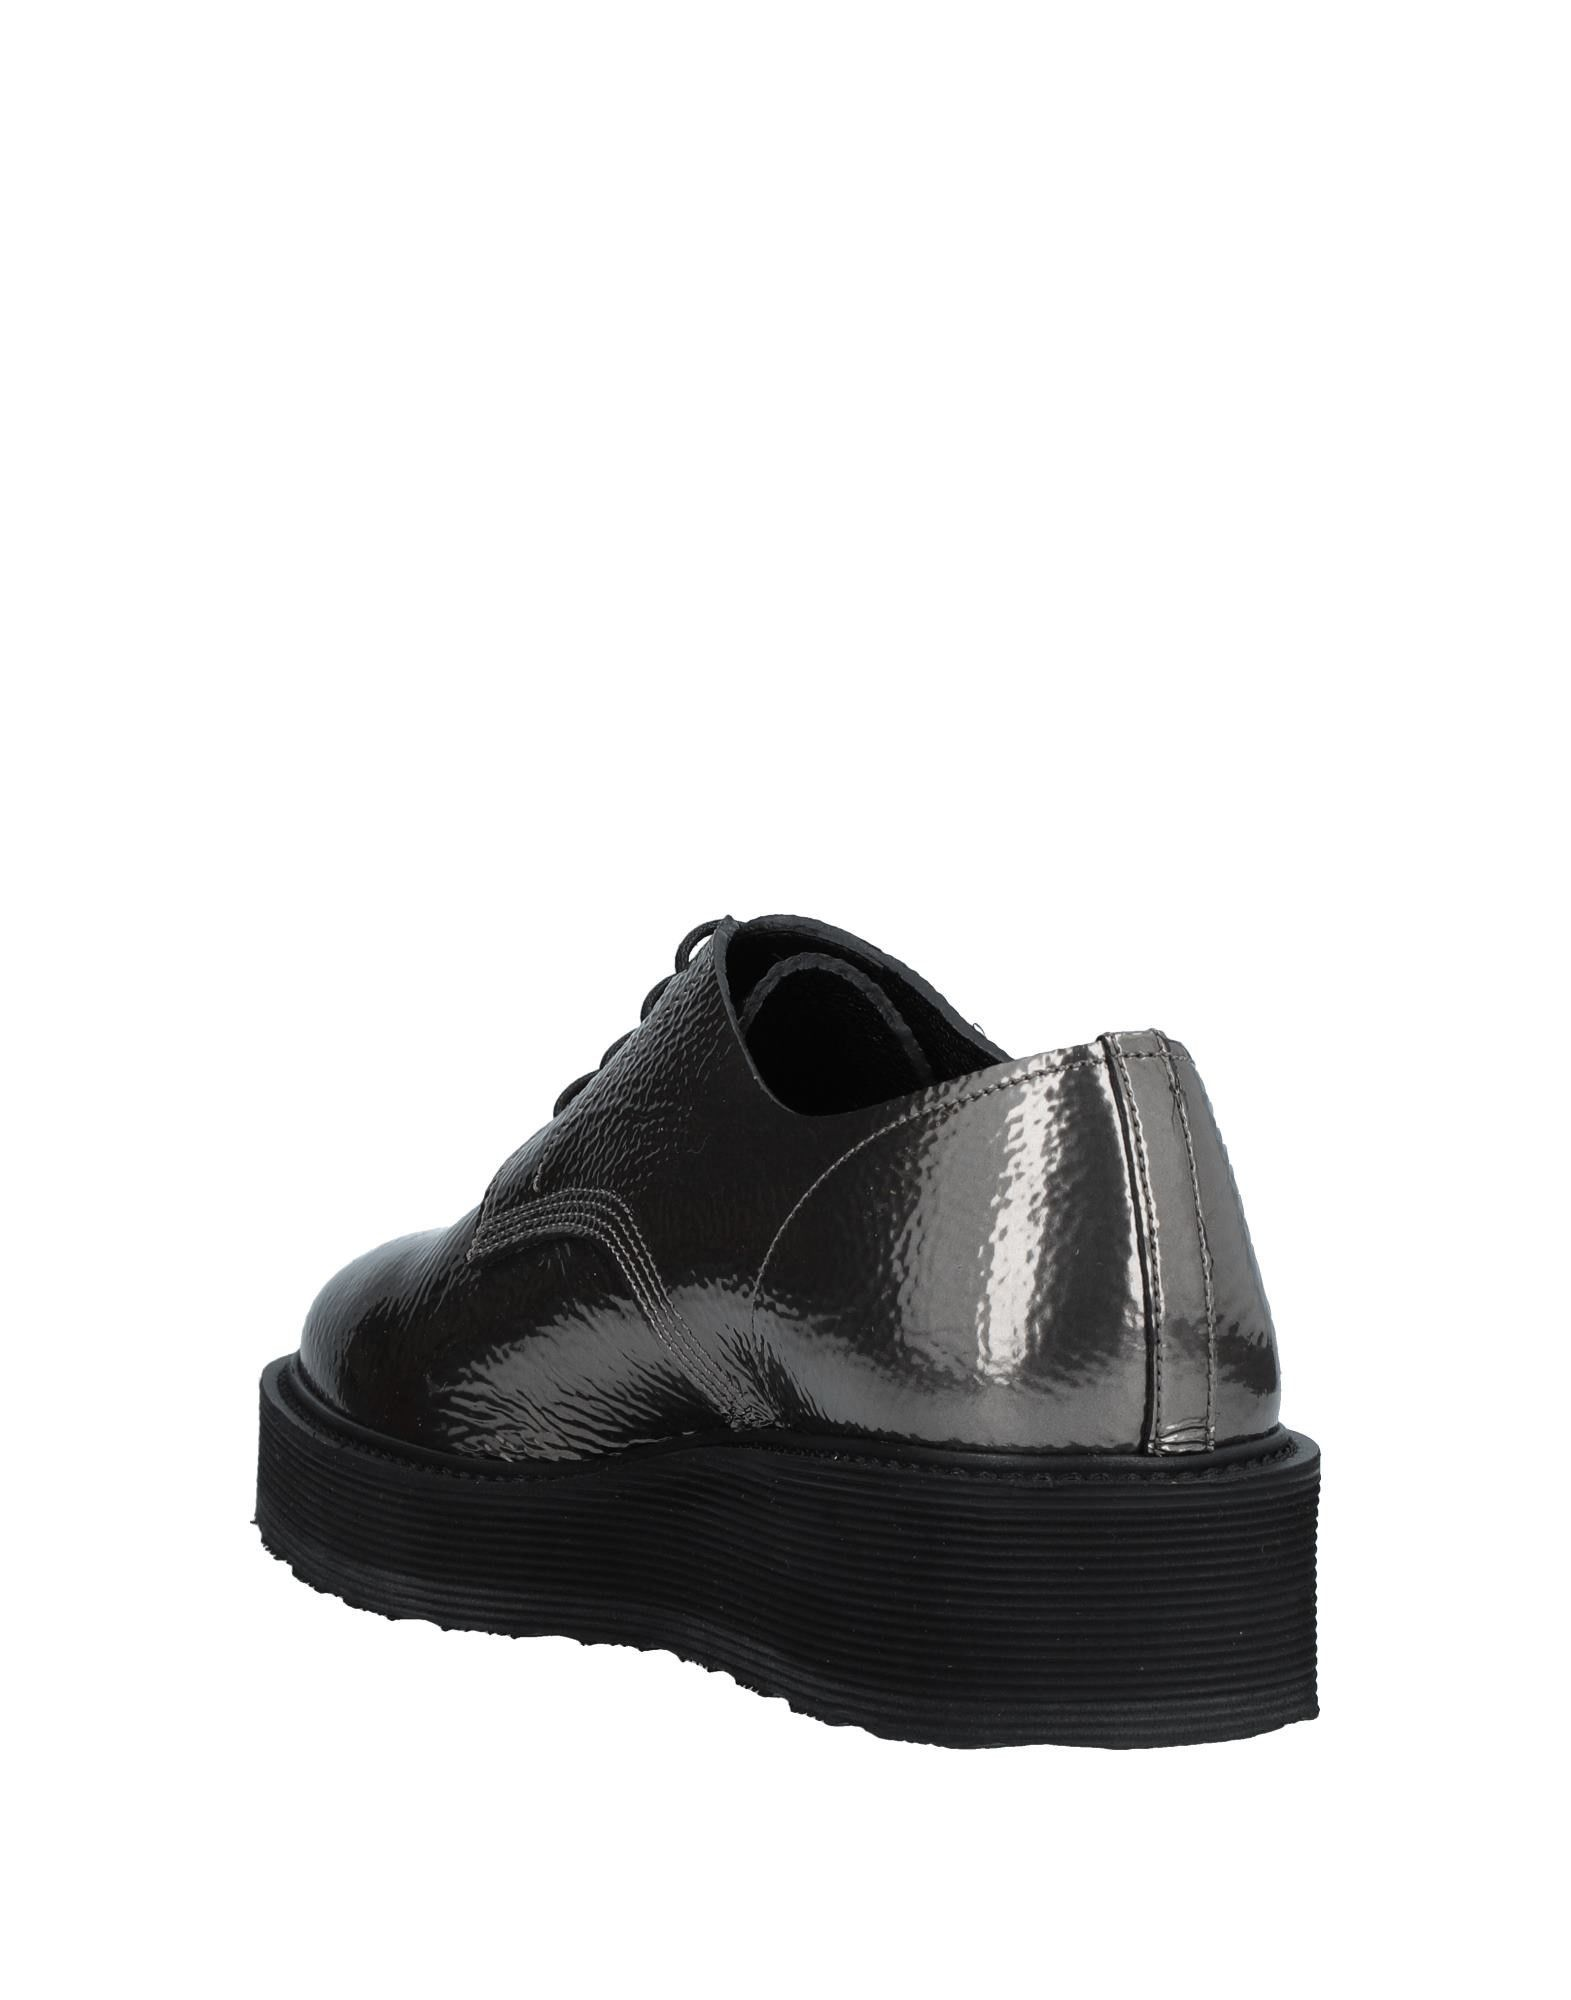 Premiata Schnürschuhe Damen  11529513BHGut aussehende strapazierfähige strapazierfähige strapazierfähige Schuhe ad58de